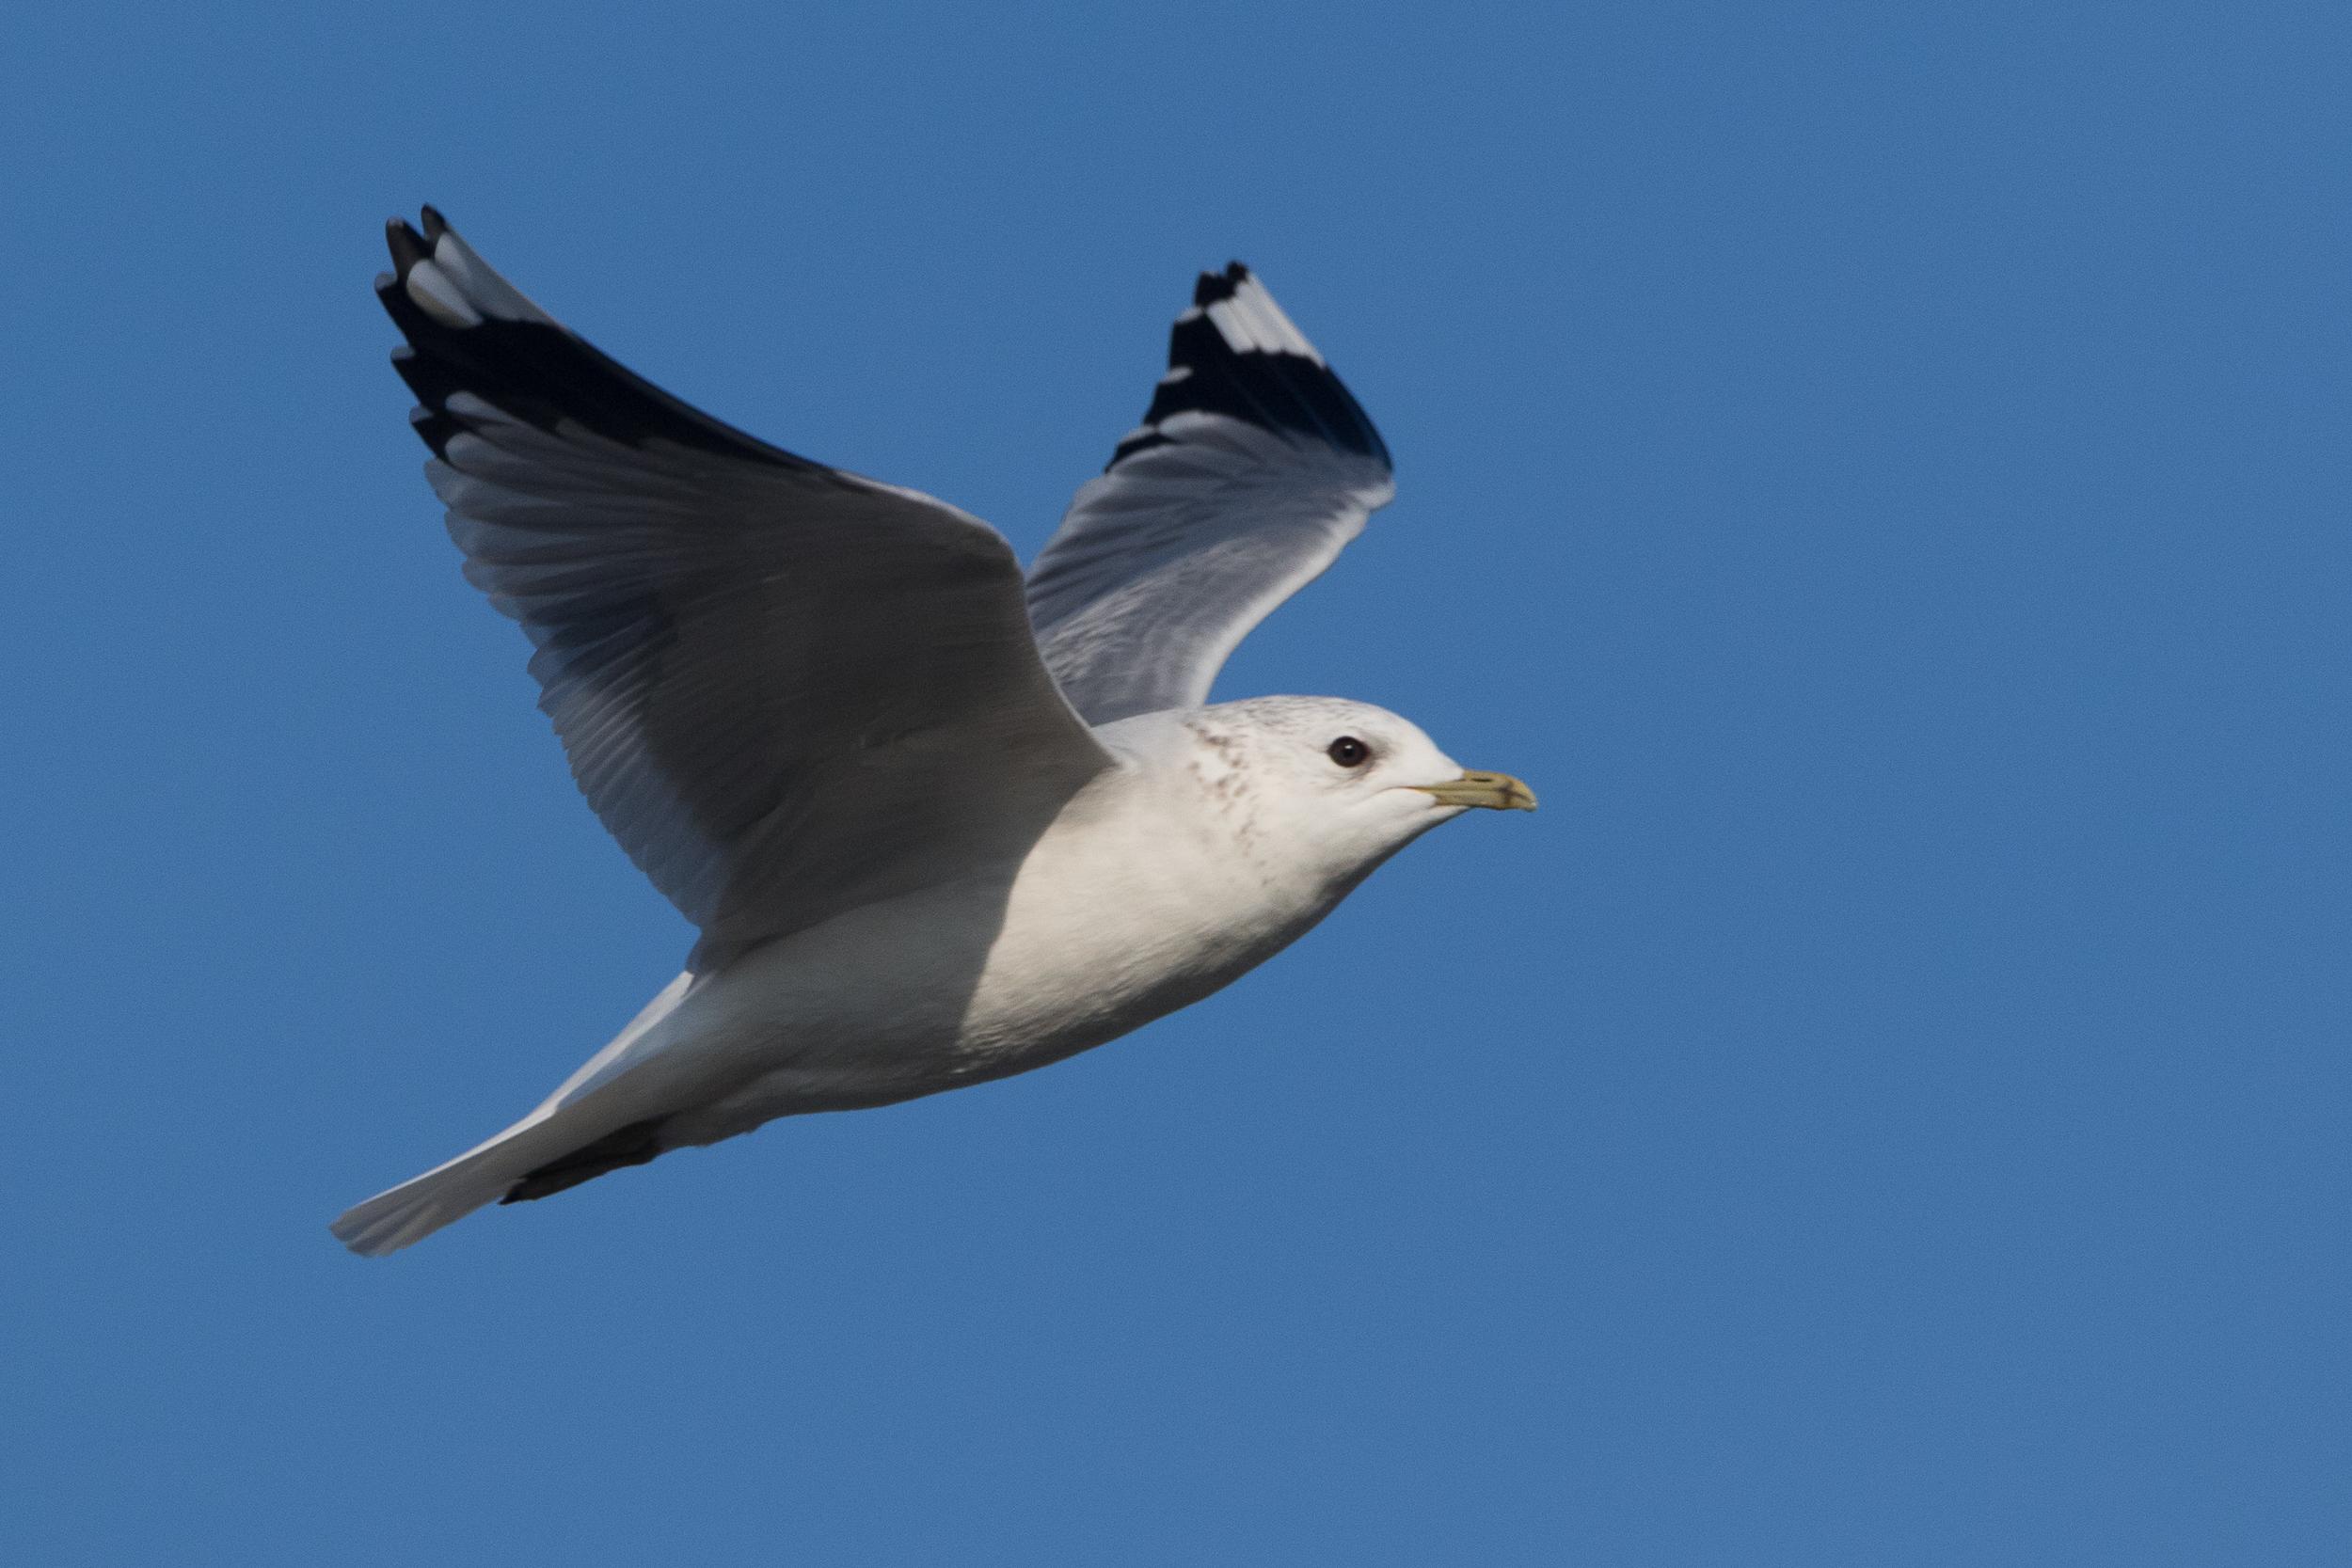 20170121-Common Gull Adult-11.jpg